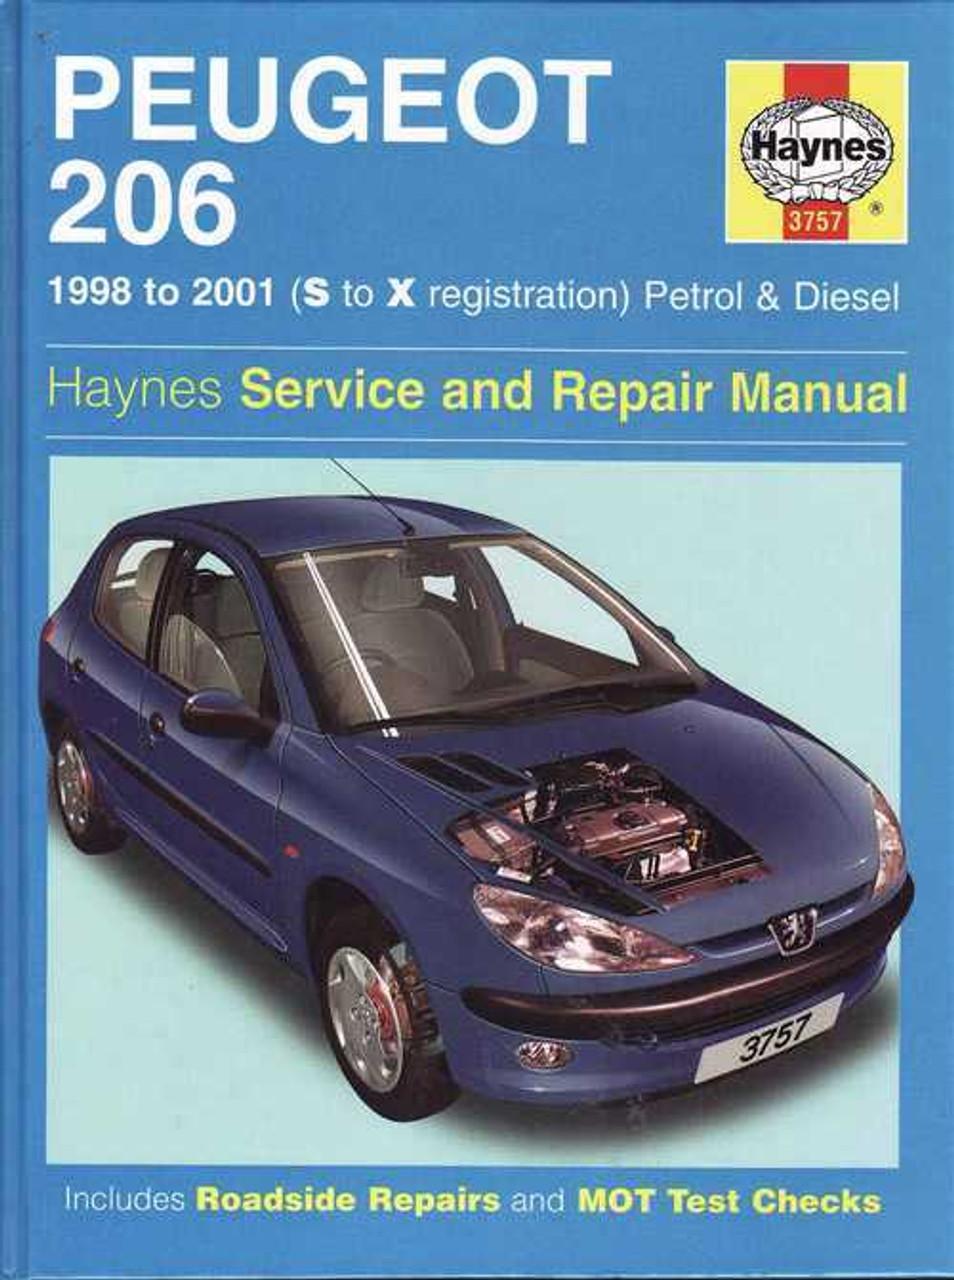 peugeot 206 1998 2001 workshop manual rh automotobookshop com au Peugeot 206 User Manual Peugeot 206 2015 Manual